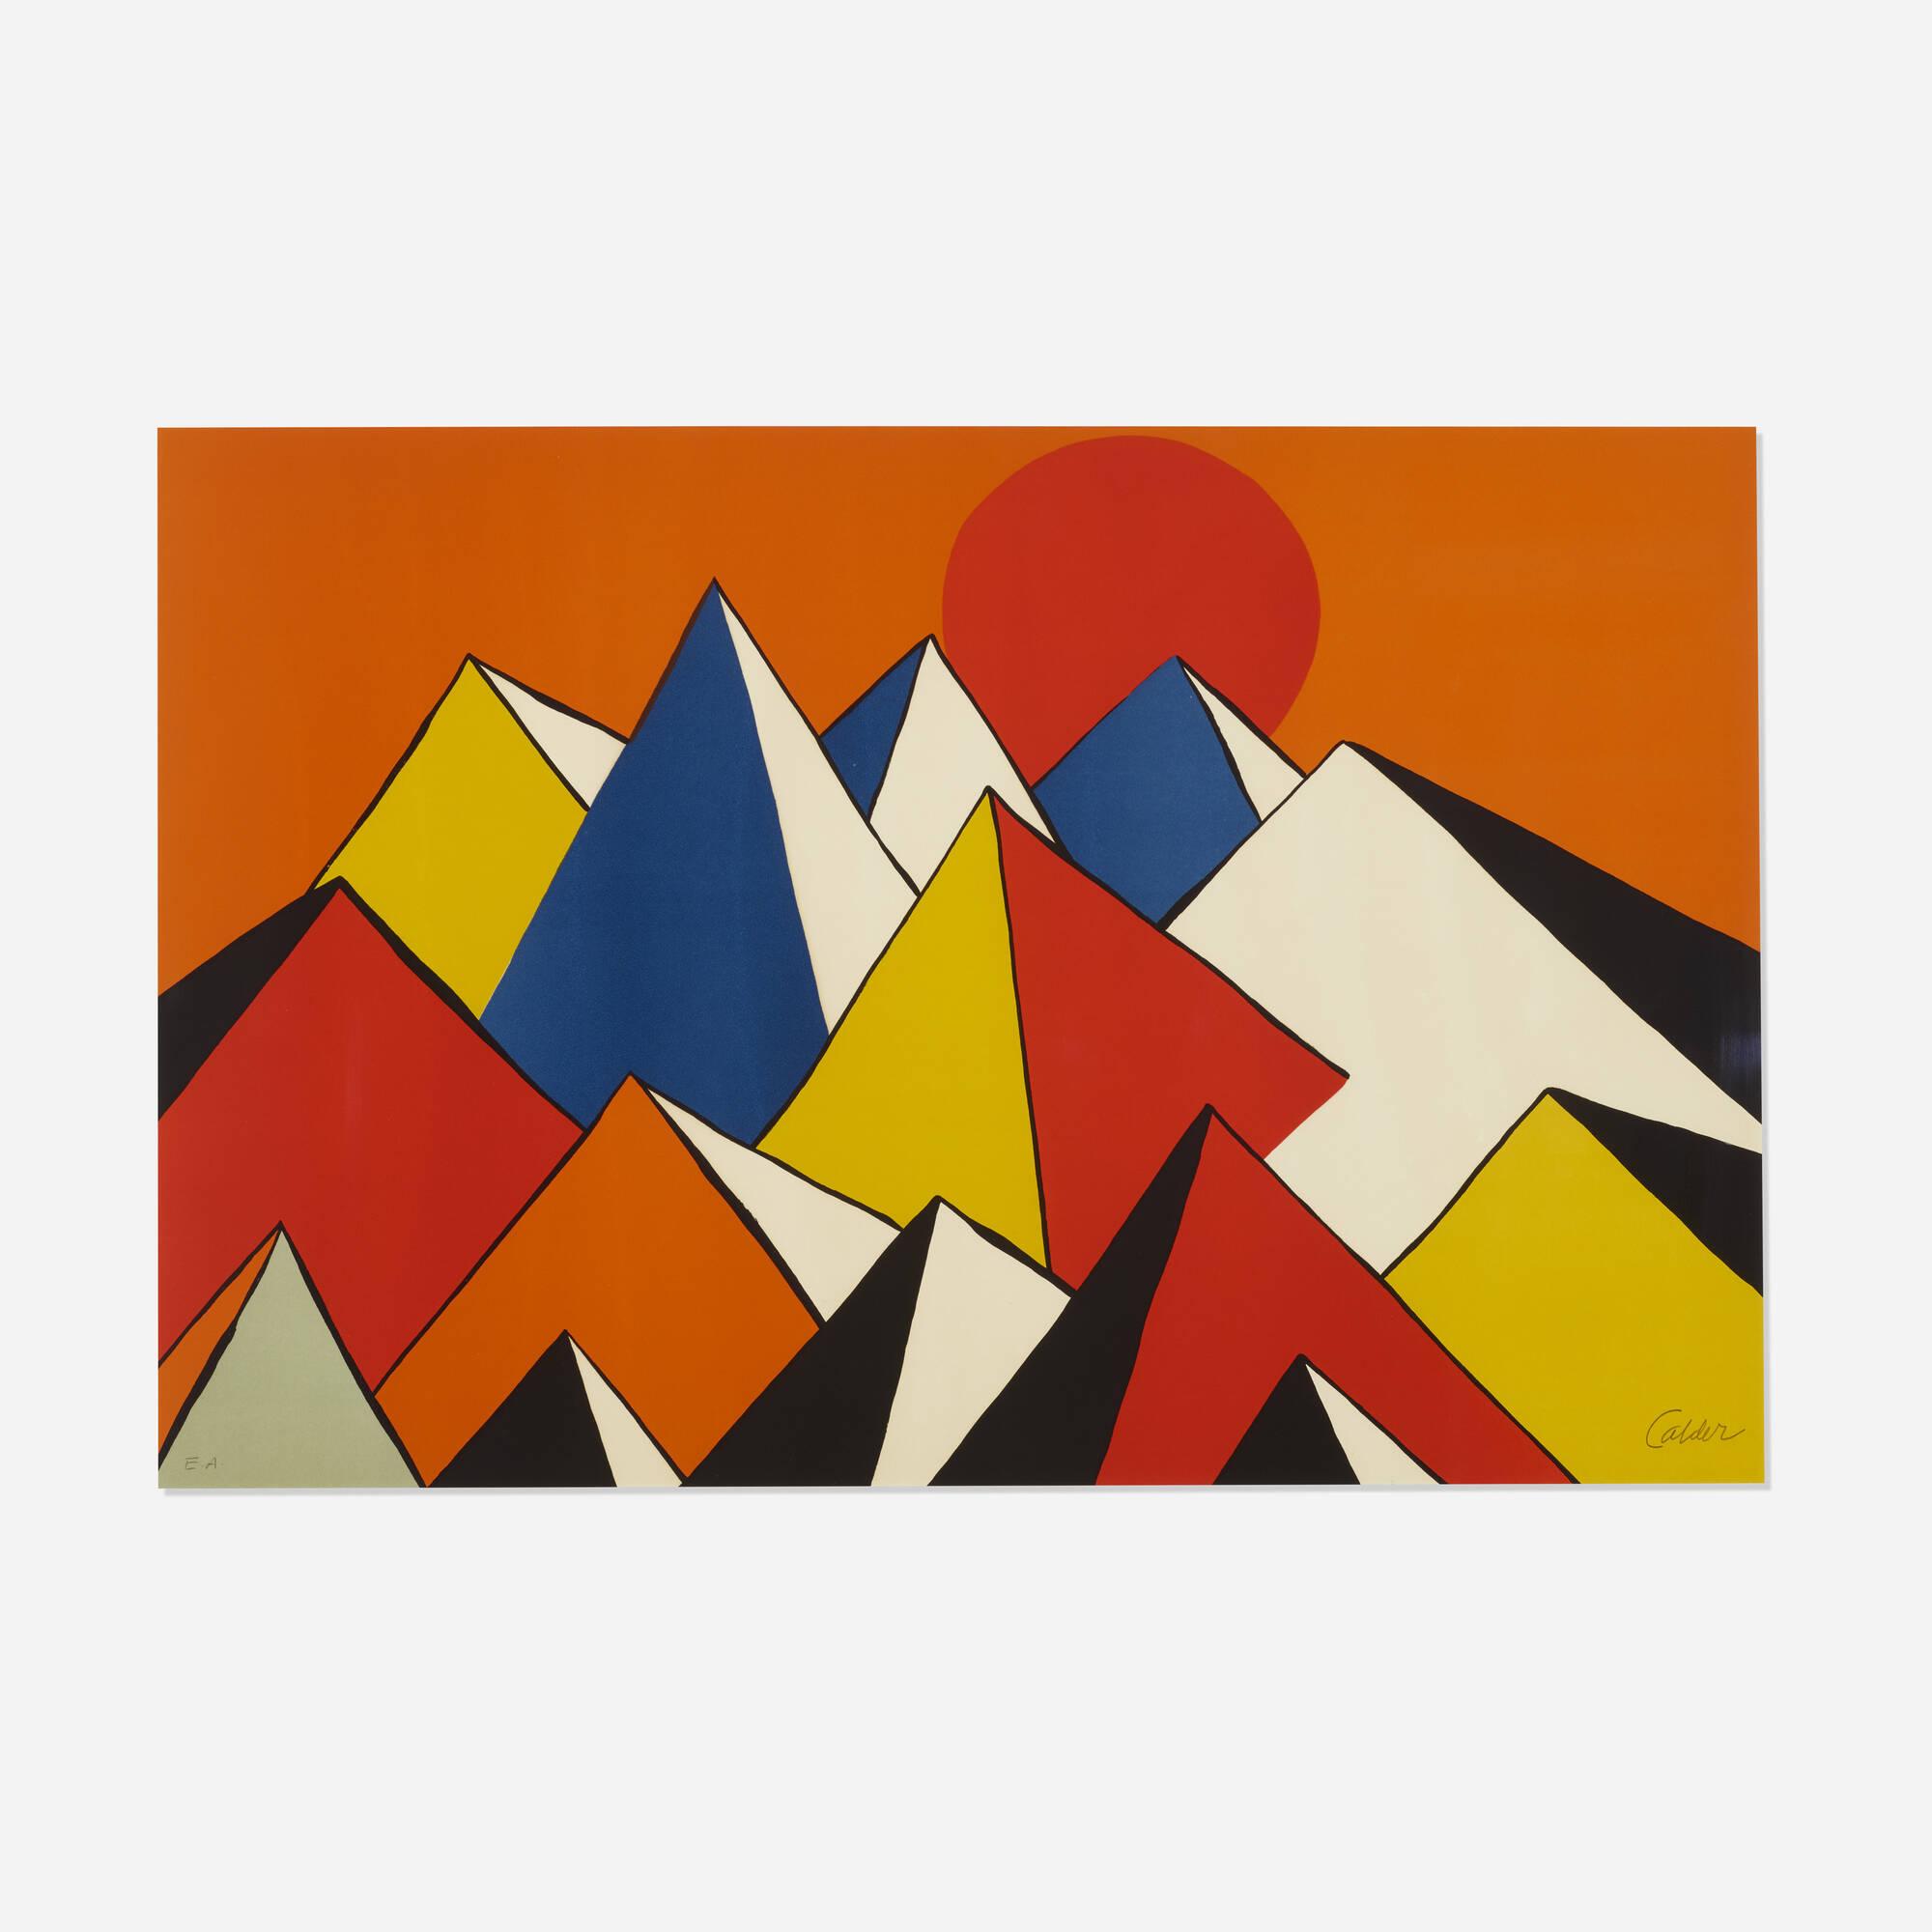 199: After Alexander Calder / Homage to the Sun (1 of 1)